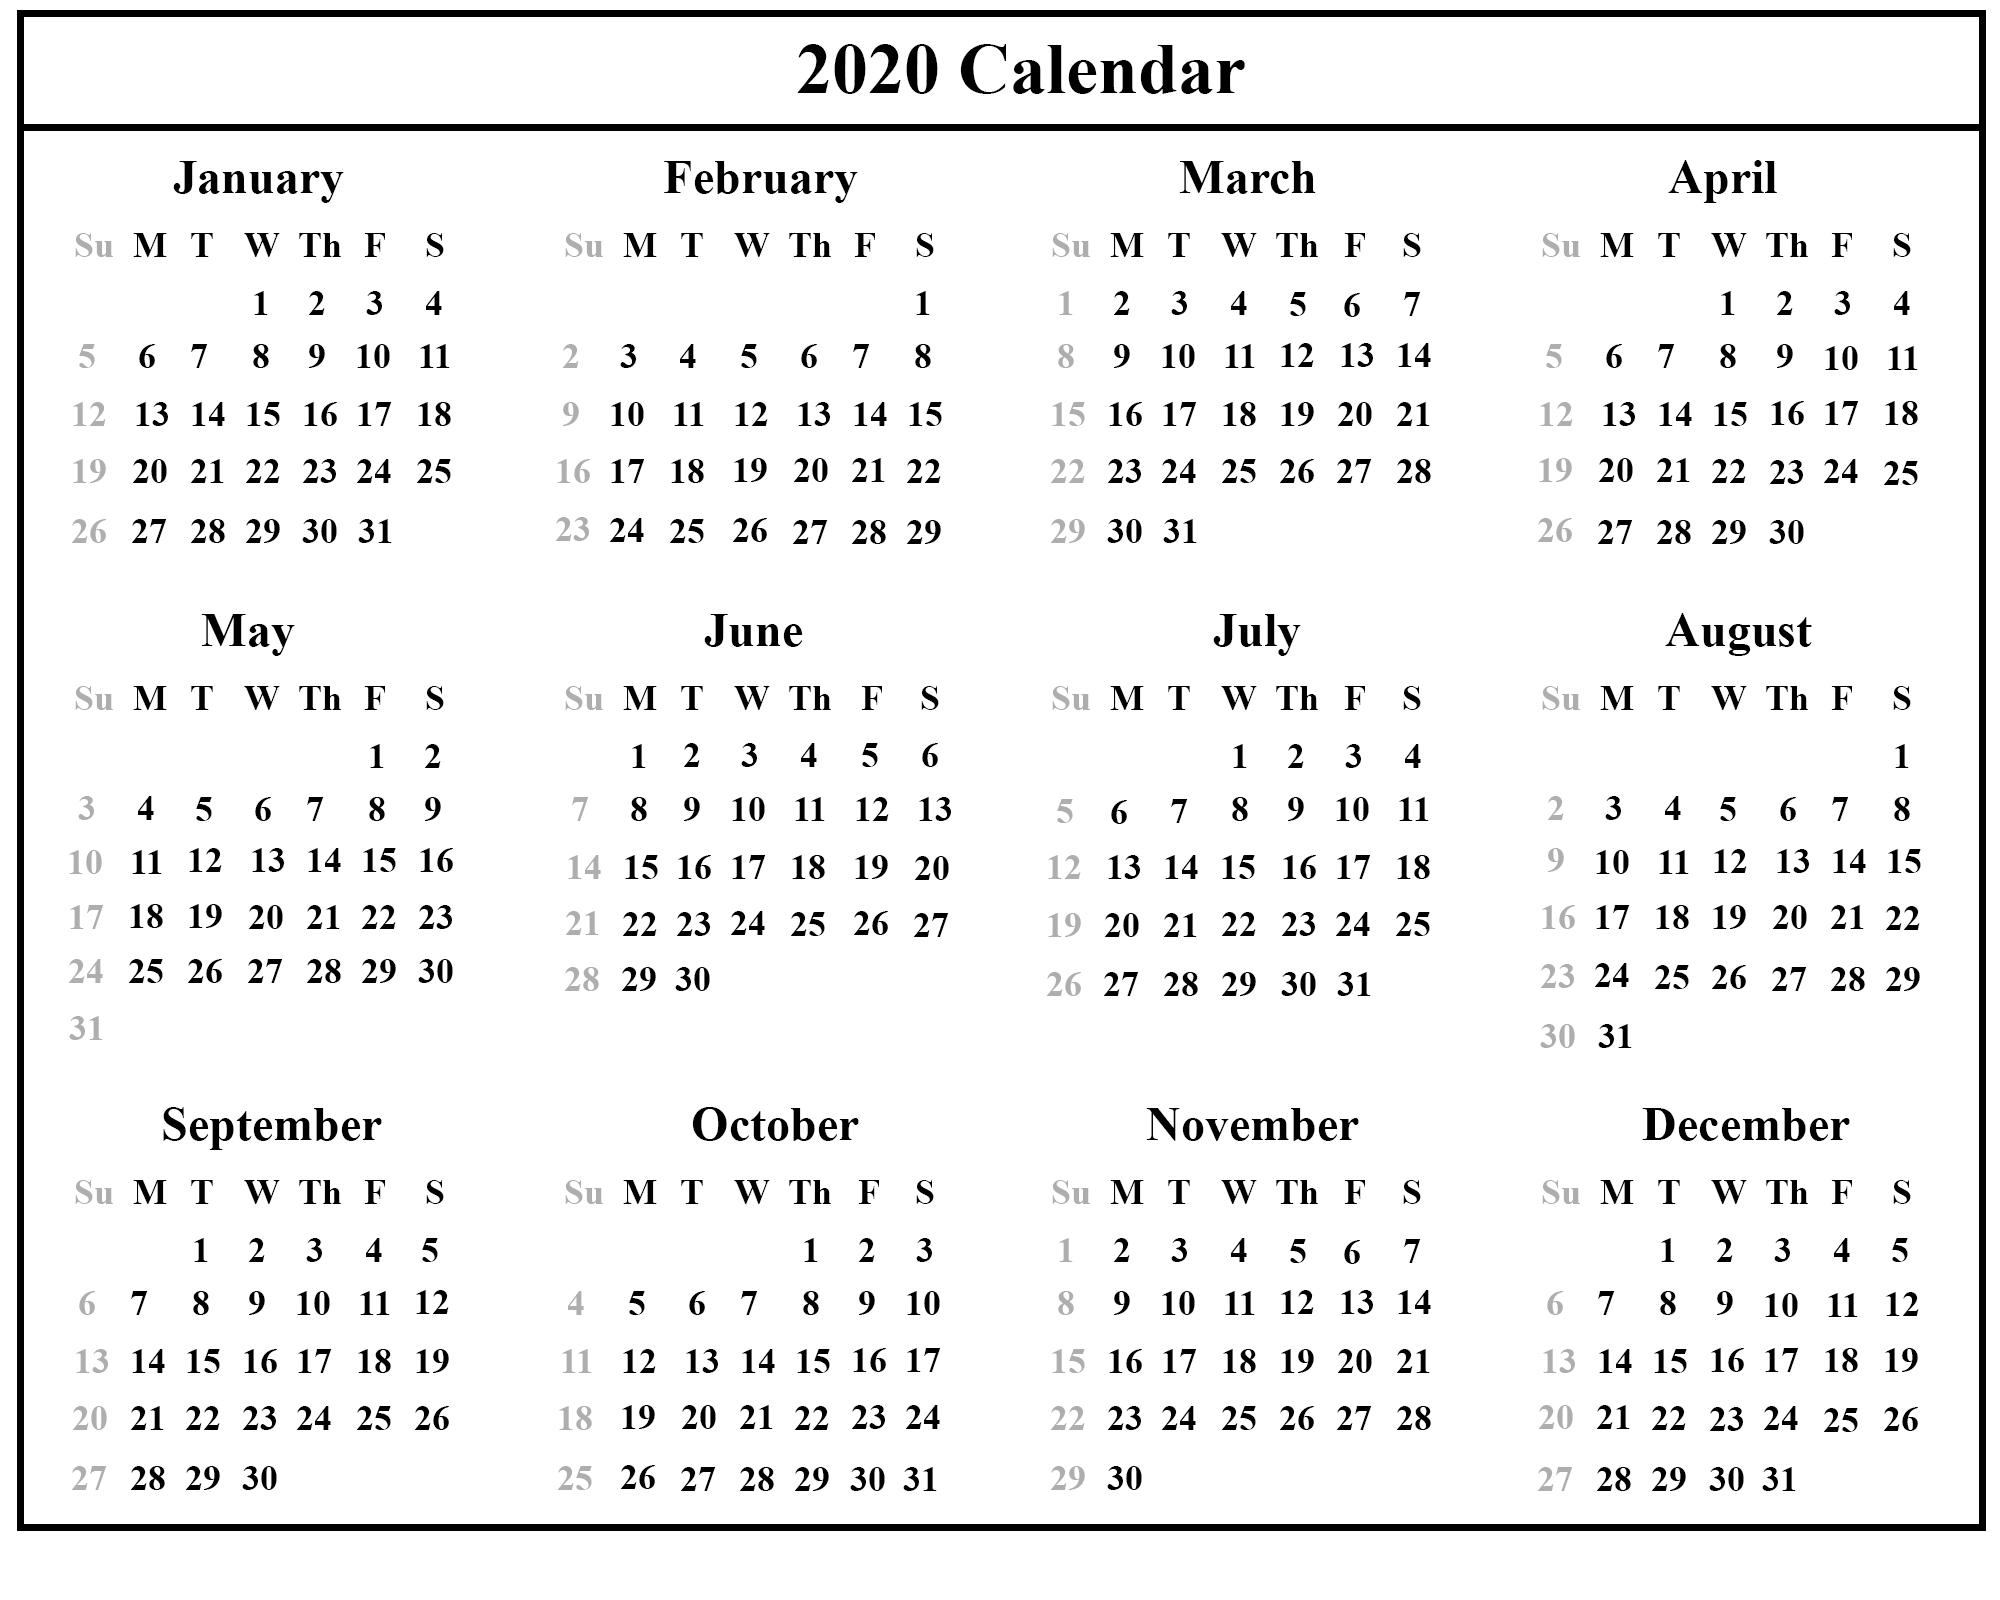 Employee Vacation Calendar Template 2020 Printable Free